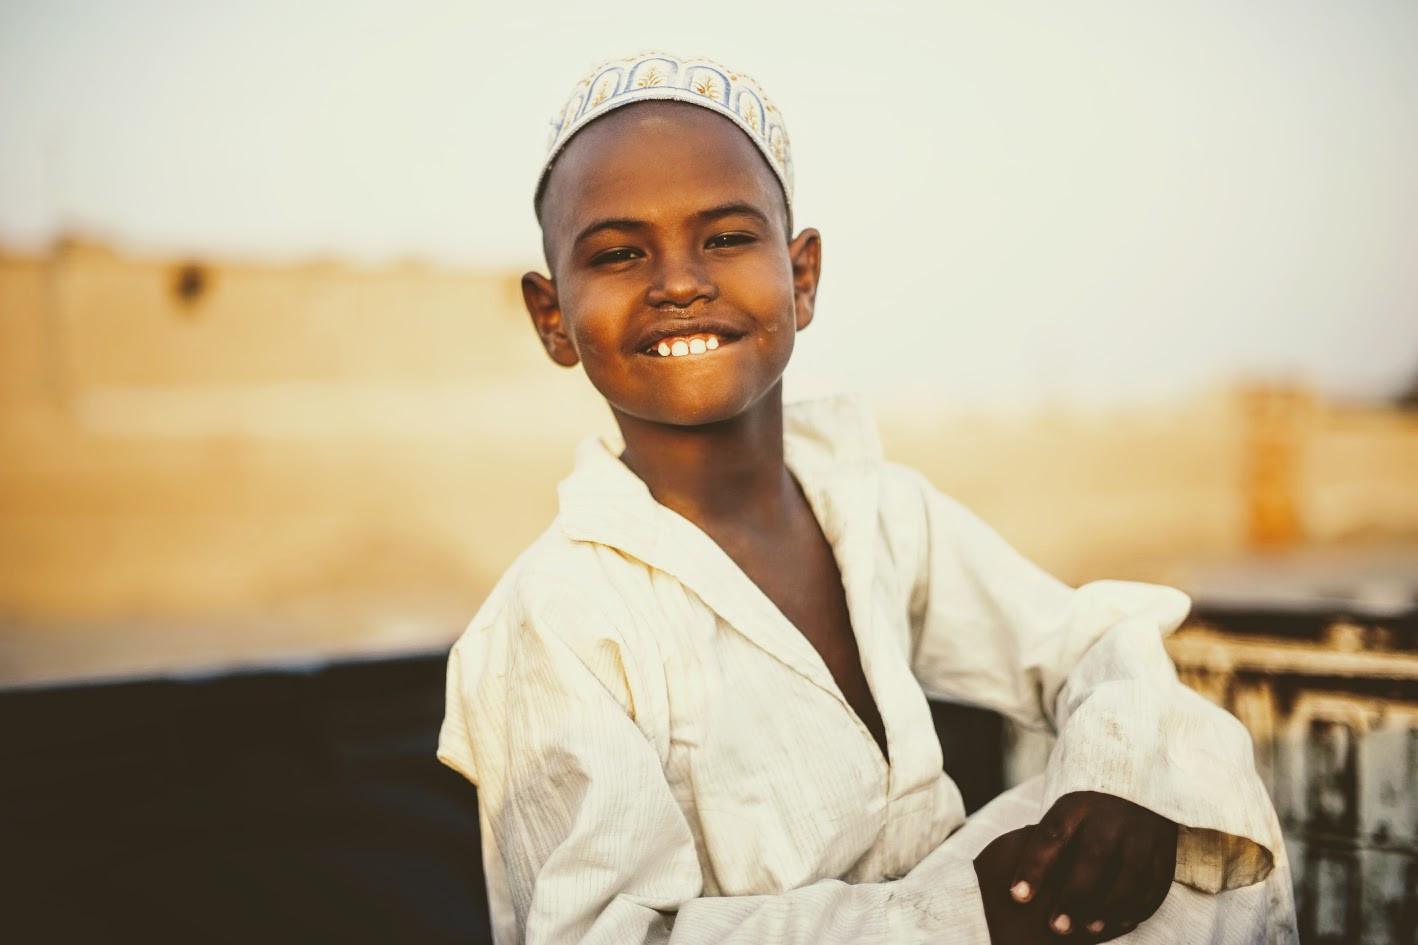 Sudan_19.jpg